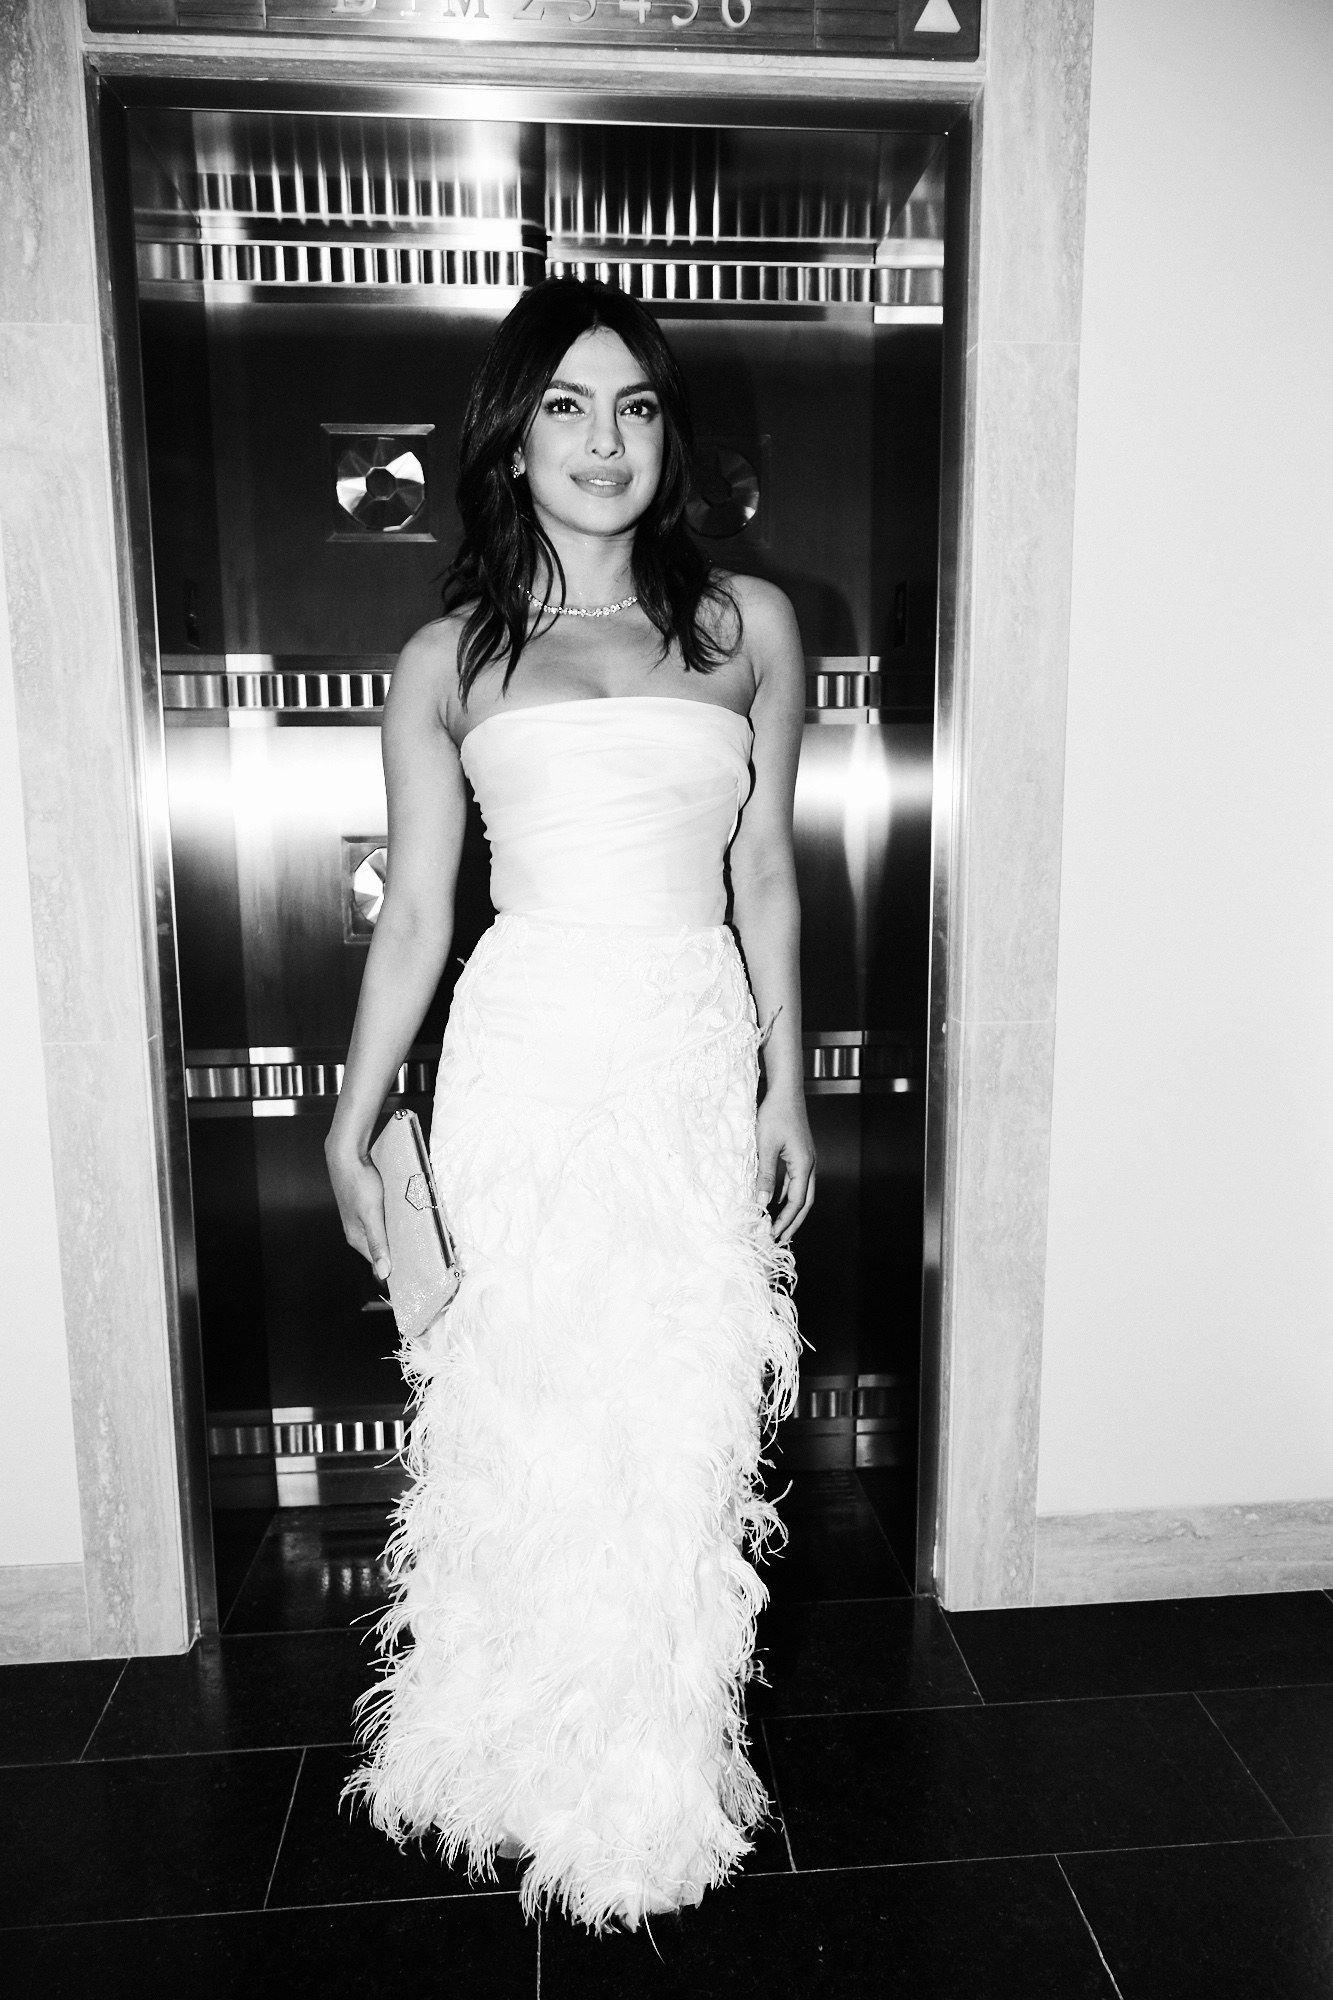 An Exclusive Look Inside Priyanka Chopra S Bridal Shower At Tiffany S Blue Box Cafe Bridal Shower Dress Wedding Dress Long Sleeve Priyanka Chopra Wedding [ 2000 x 1333 Pixel ]